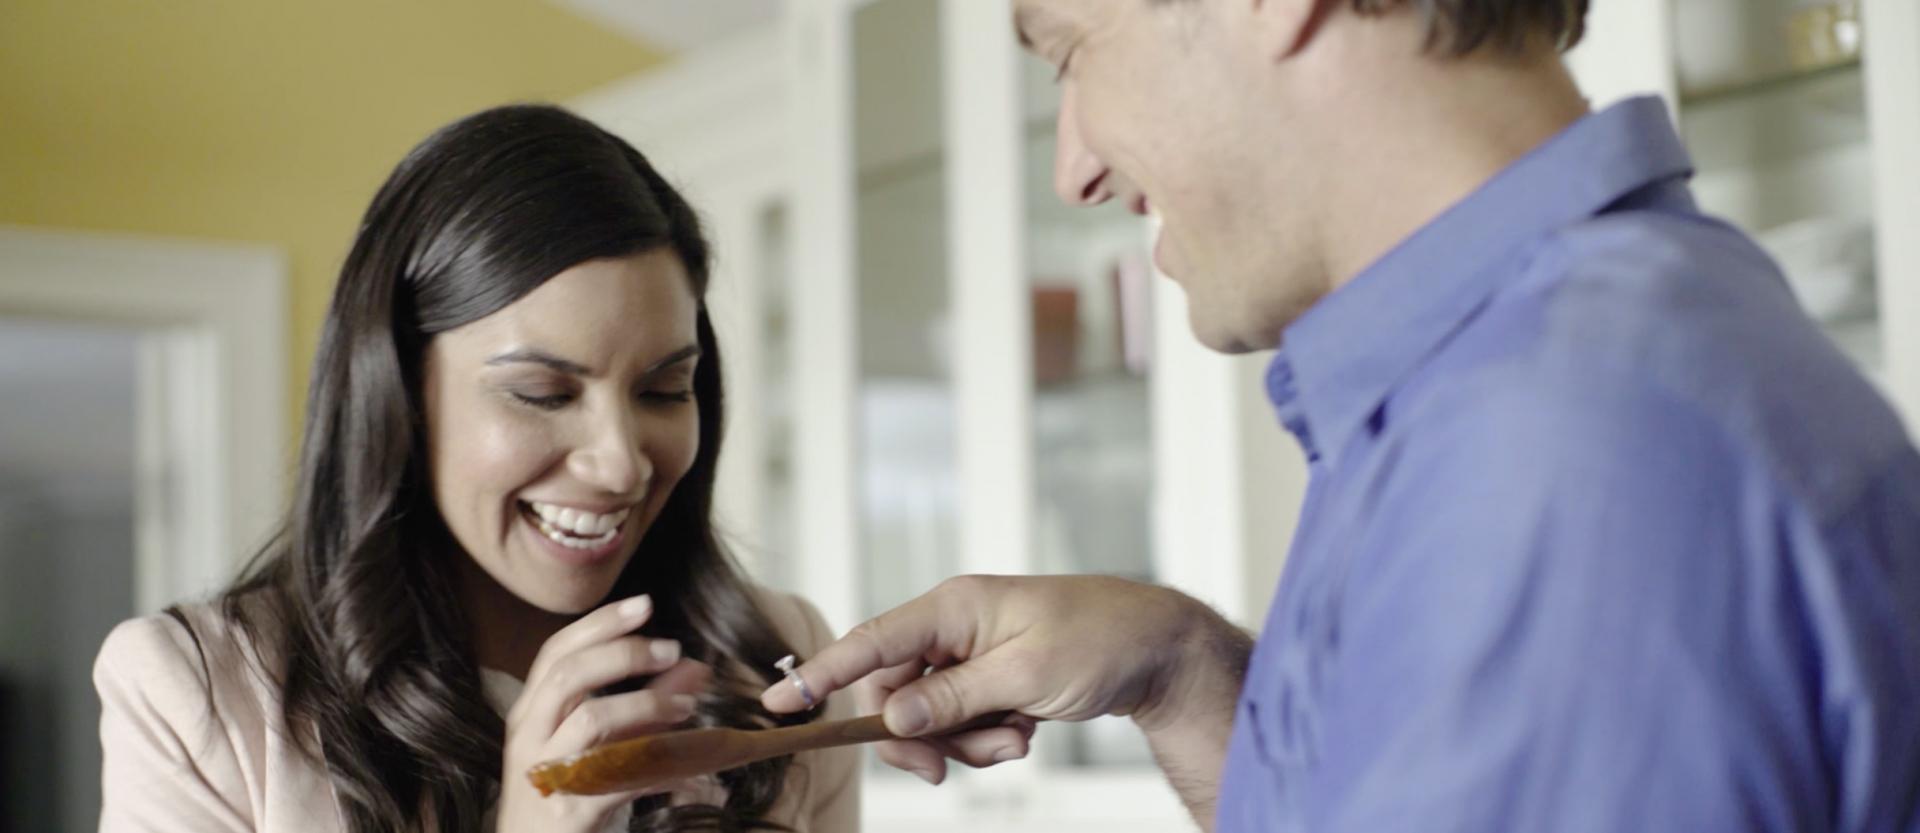 Alessi Food digital overhaul Schifino Lee